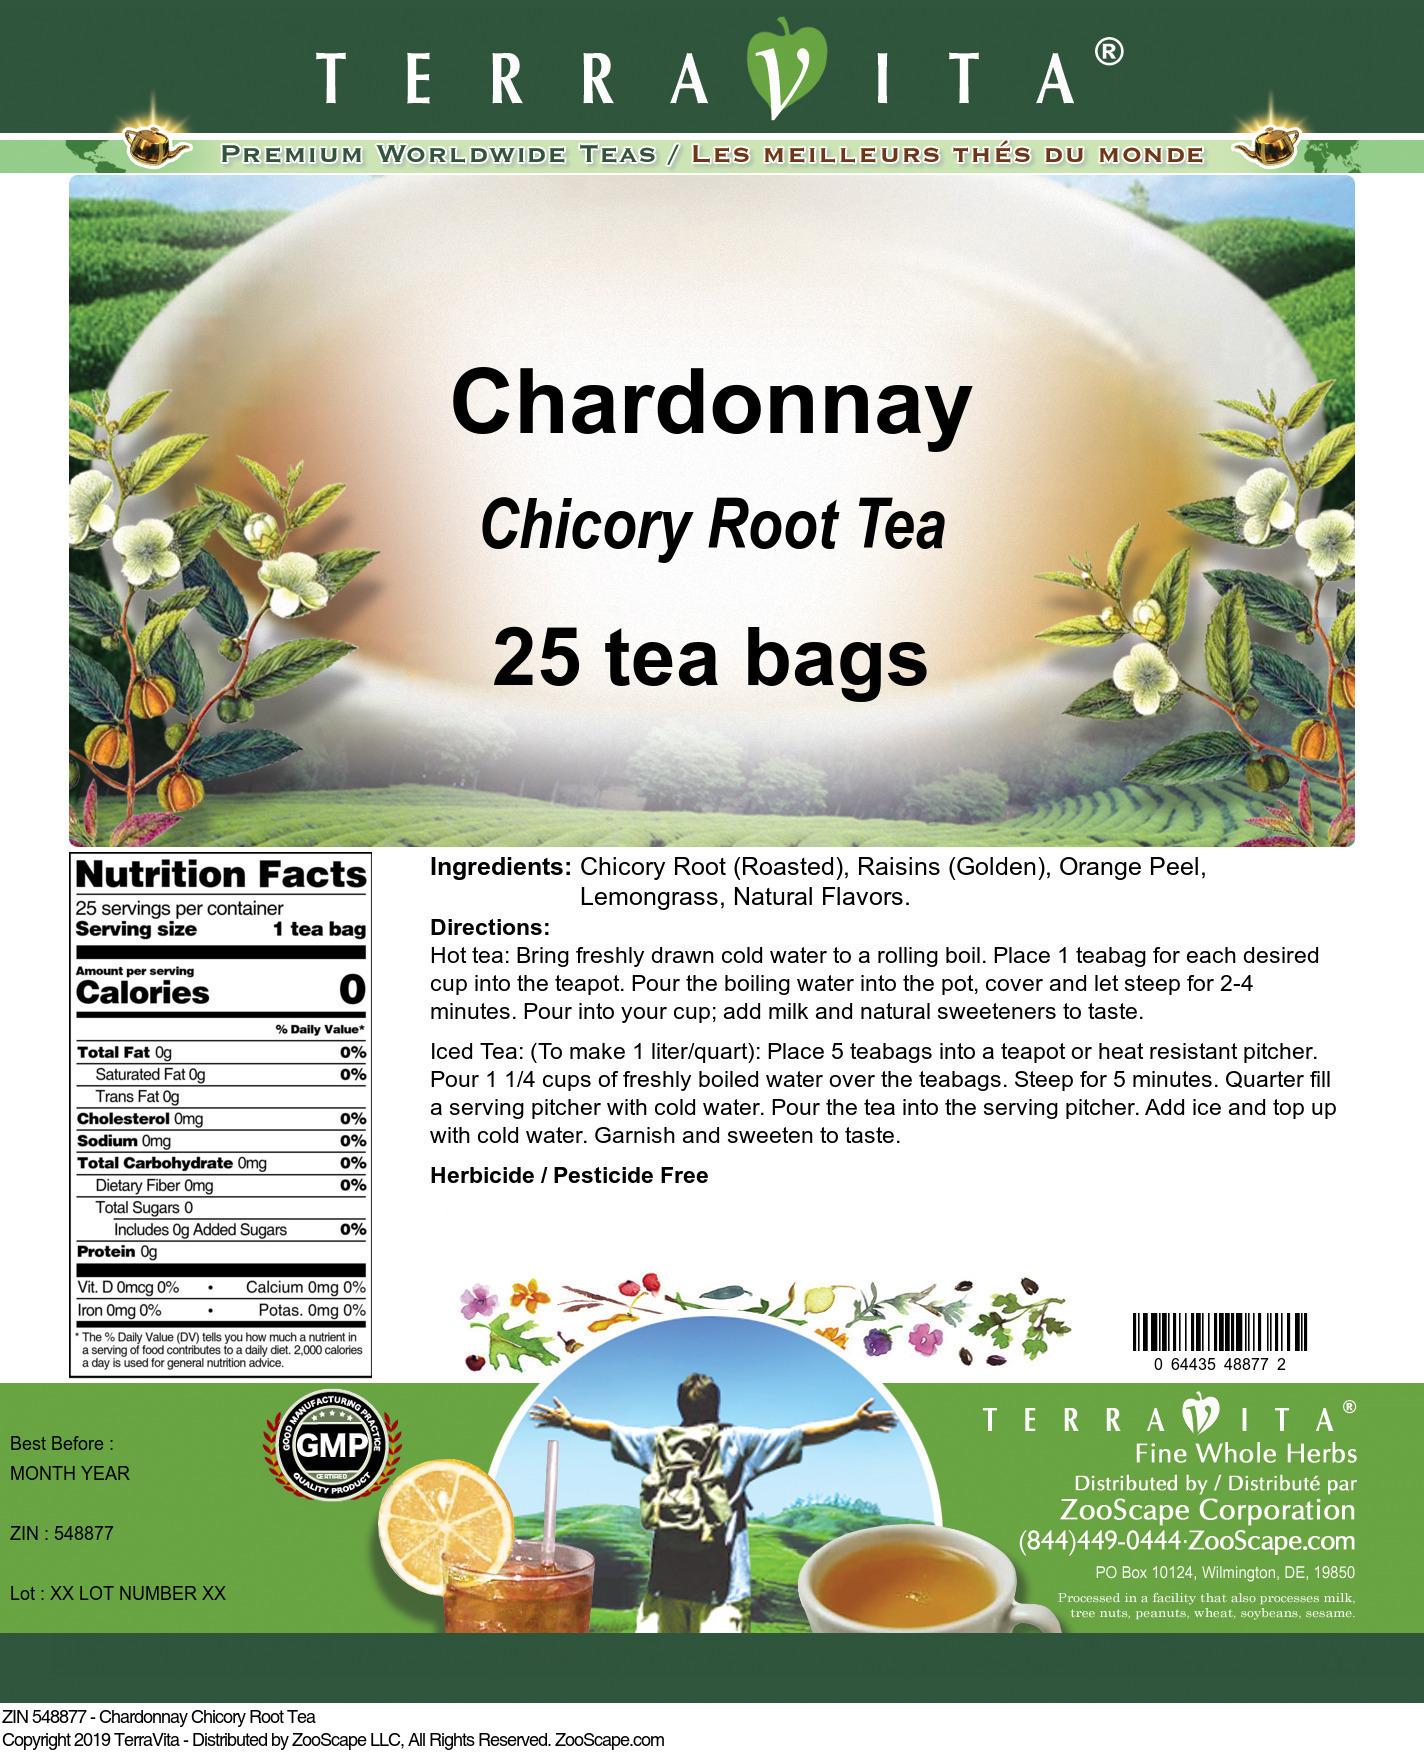 Chardonnay Chicory Root Tea